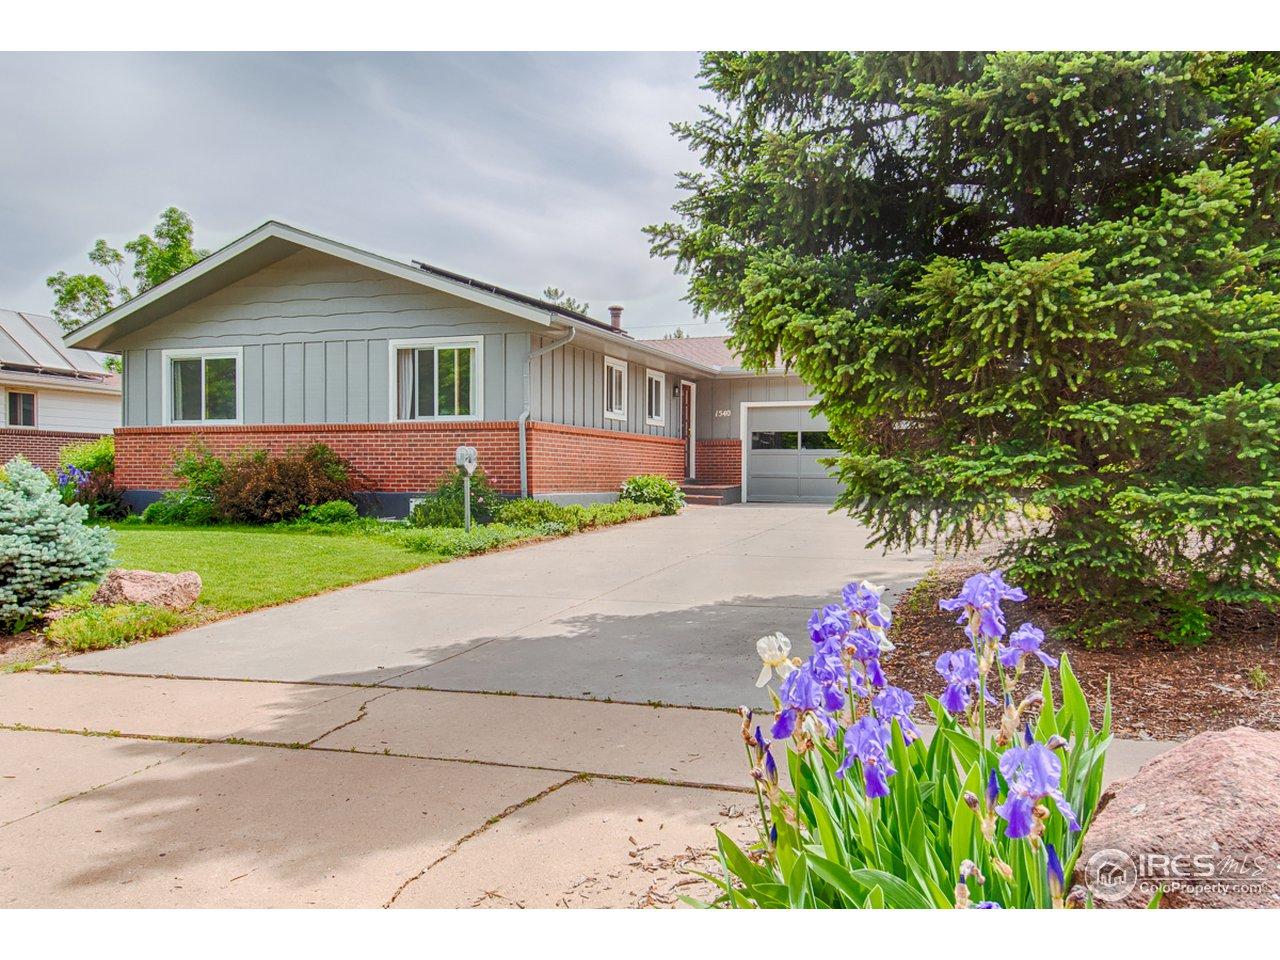 1540 Lehigh St, Boulder CO 80305